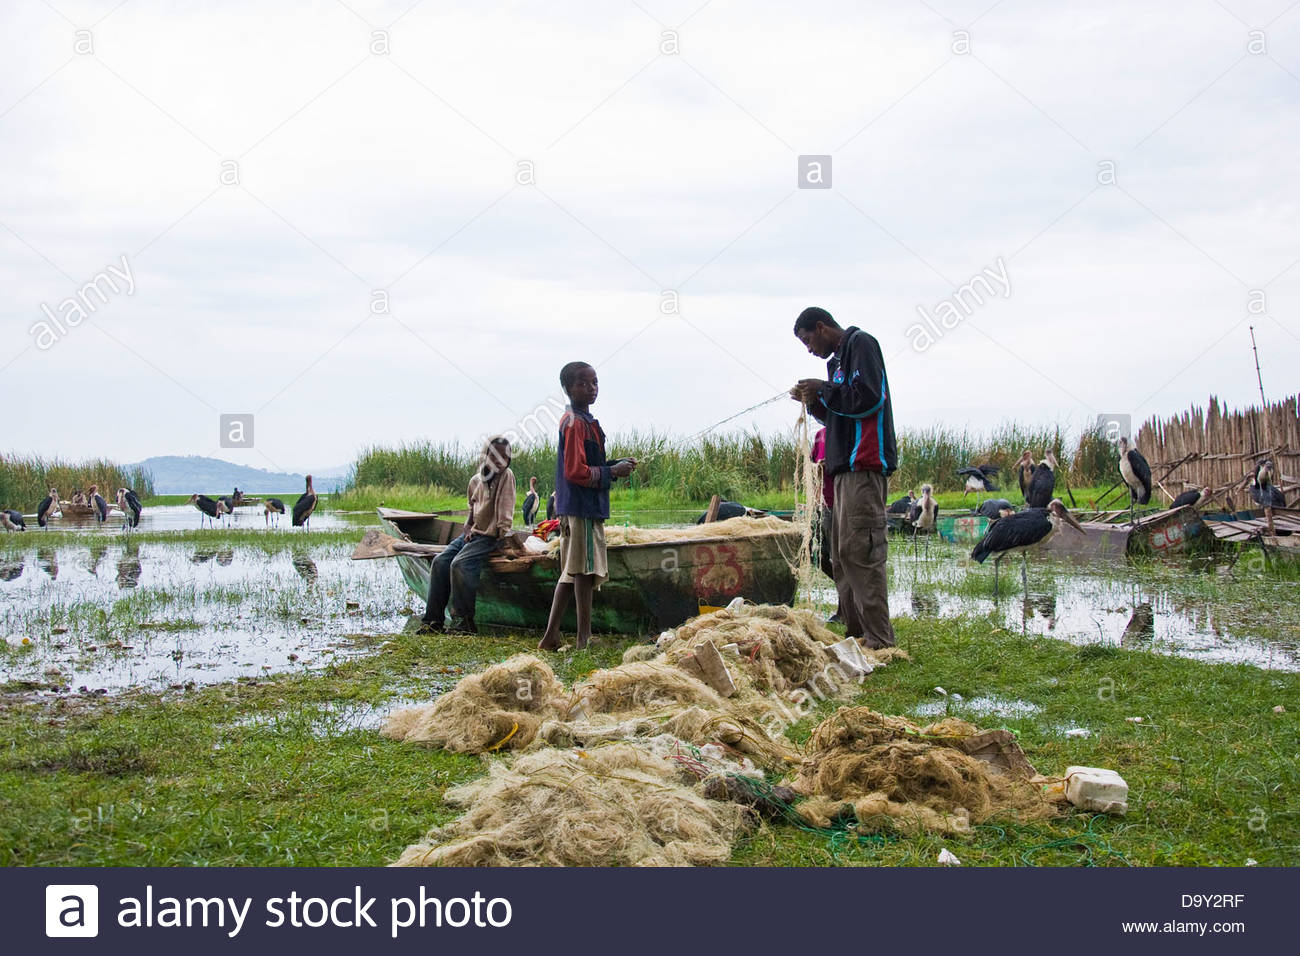 Fish market,Awasa,Ethiopia - Stock Image